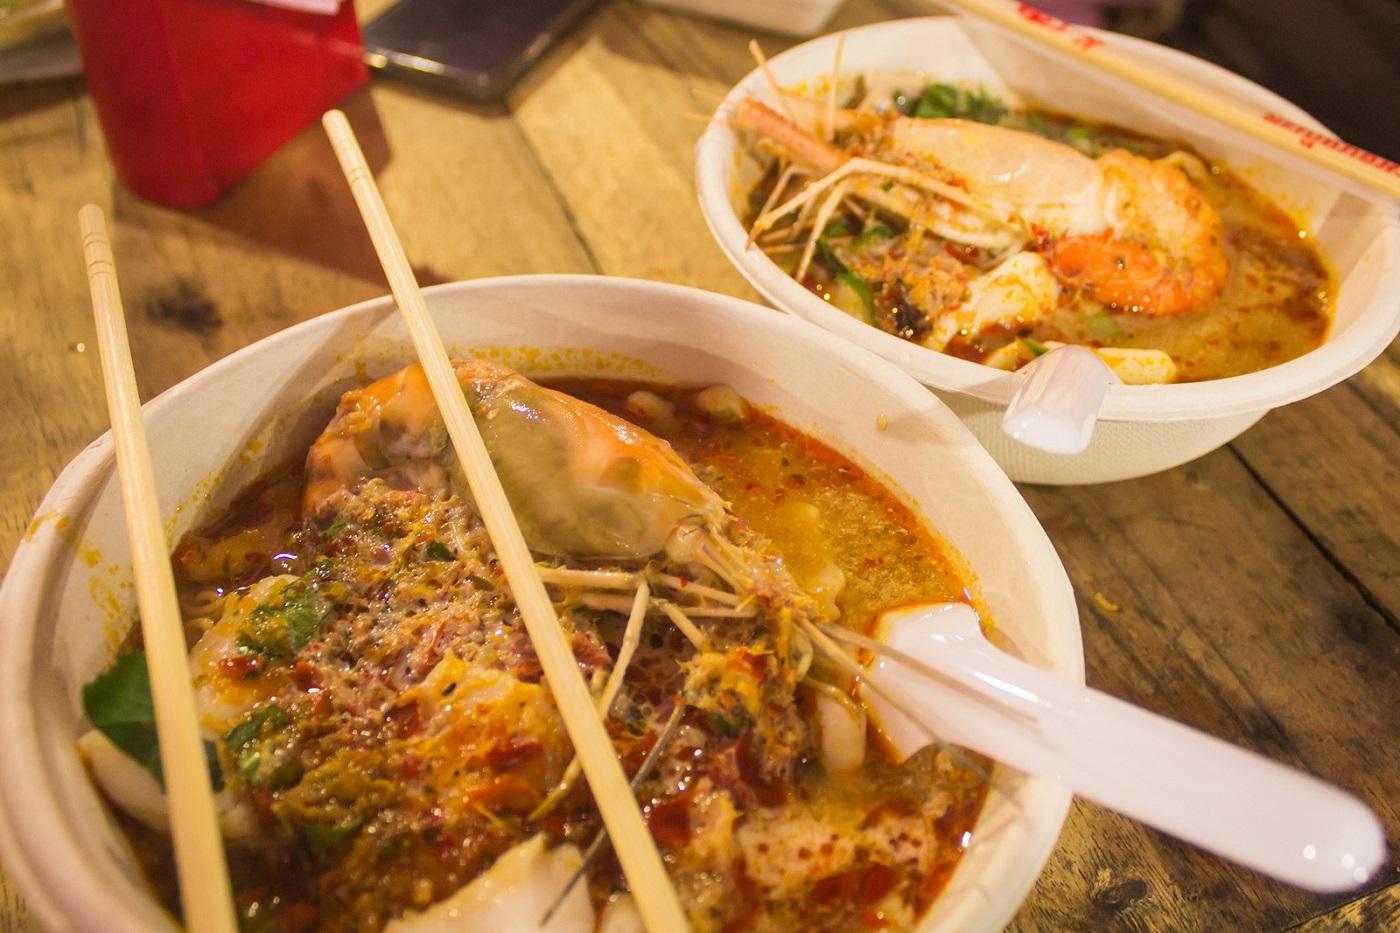 bangkok markets rot fai train market srinakarin night market Tom yum noodle soup with shrimp